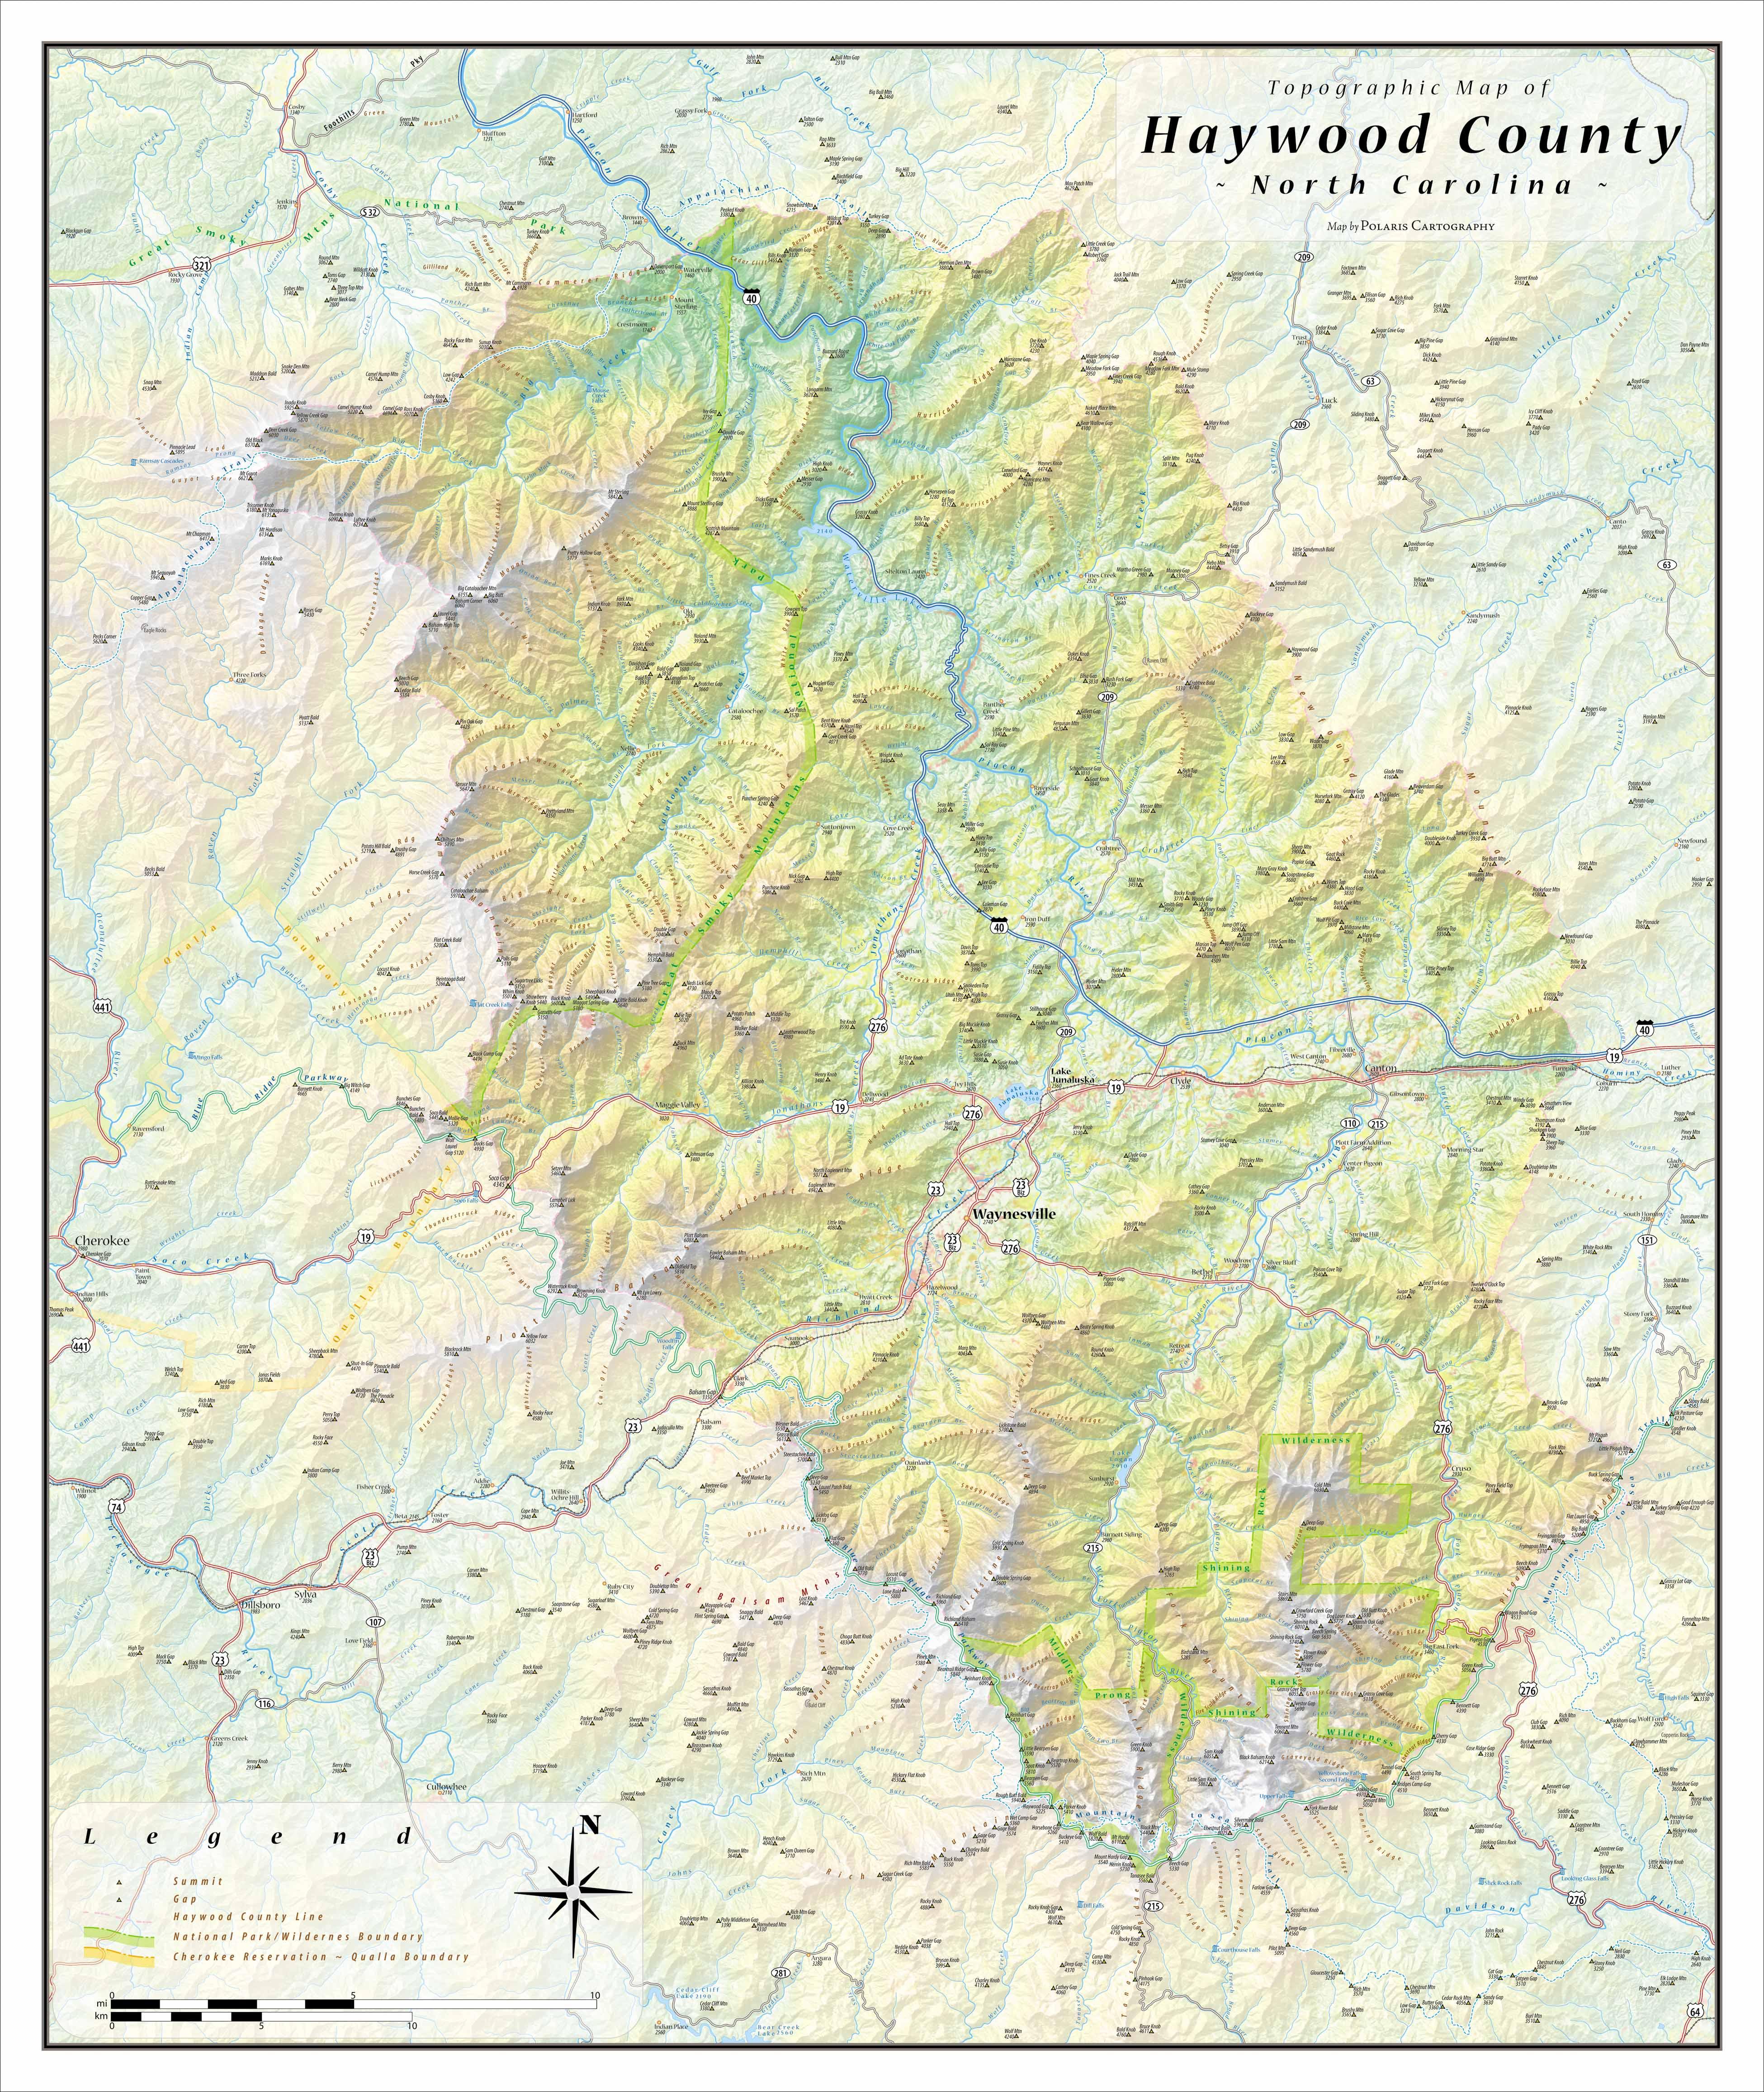 Haywood County Topographical Map haywood north carolina • mappery